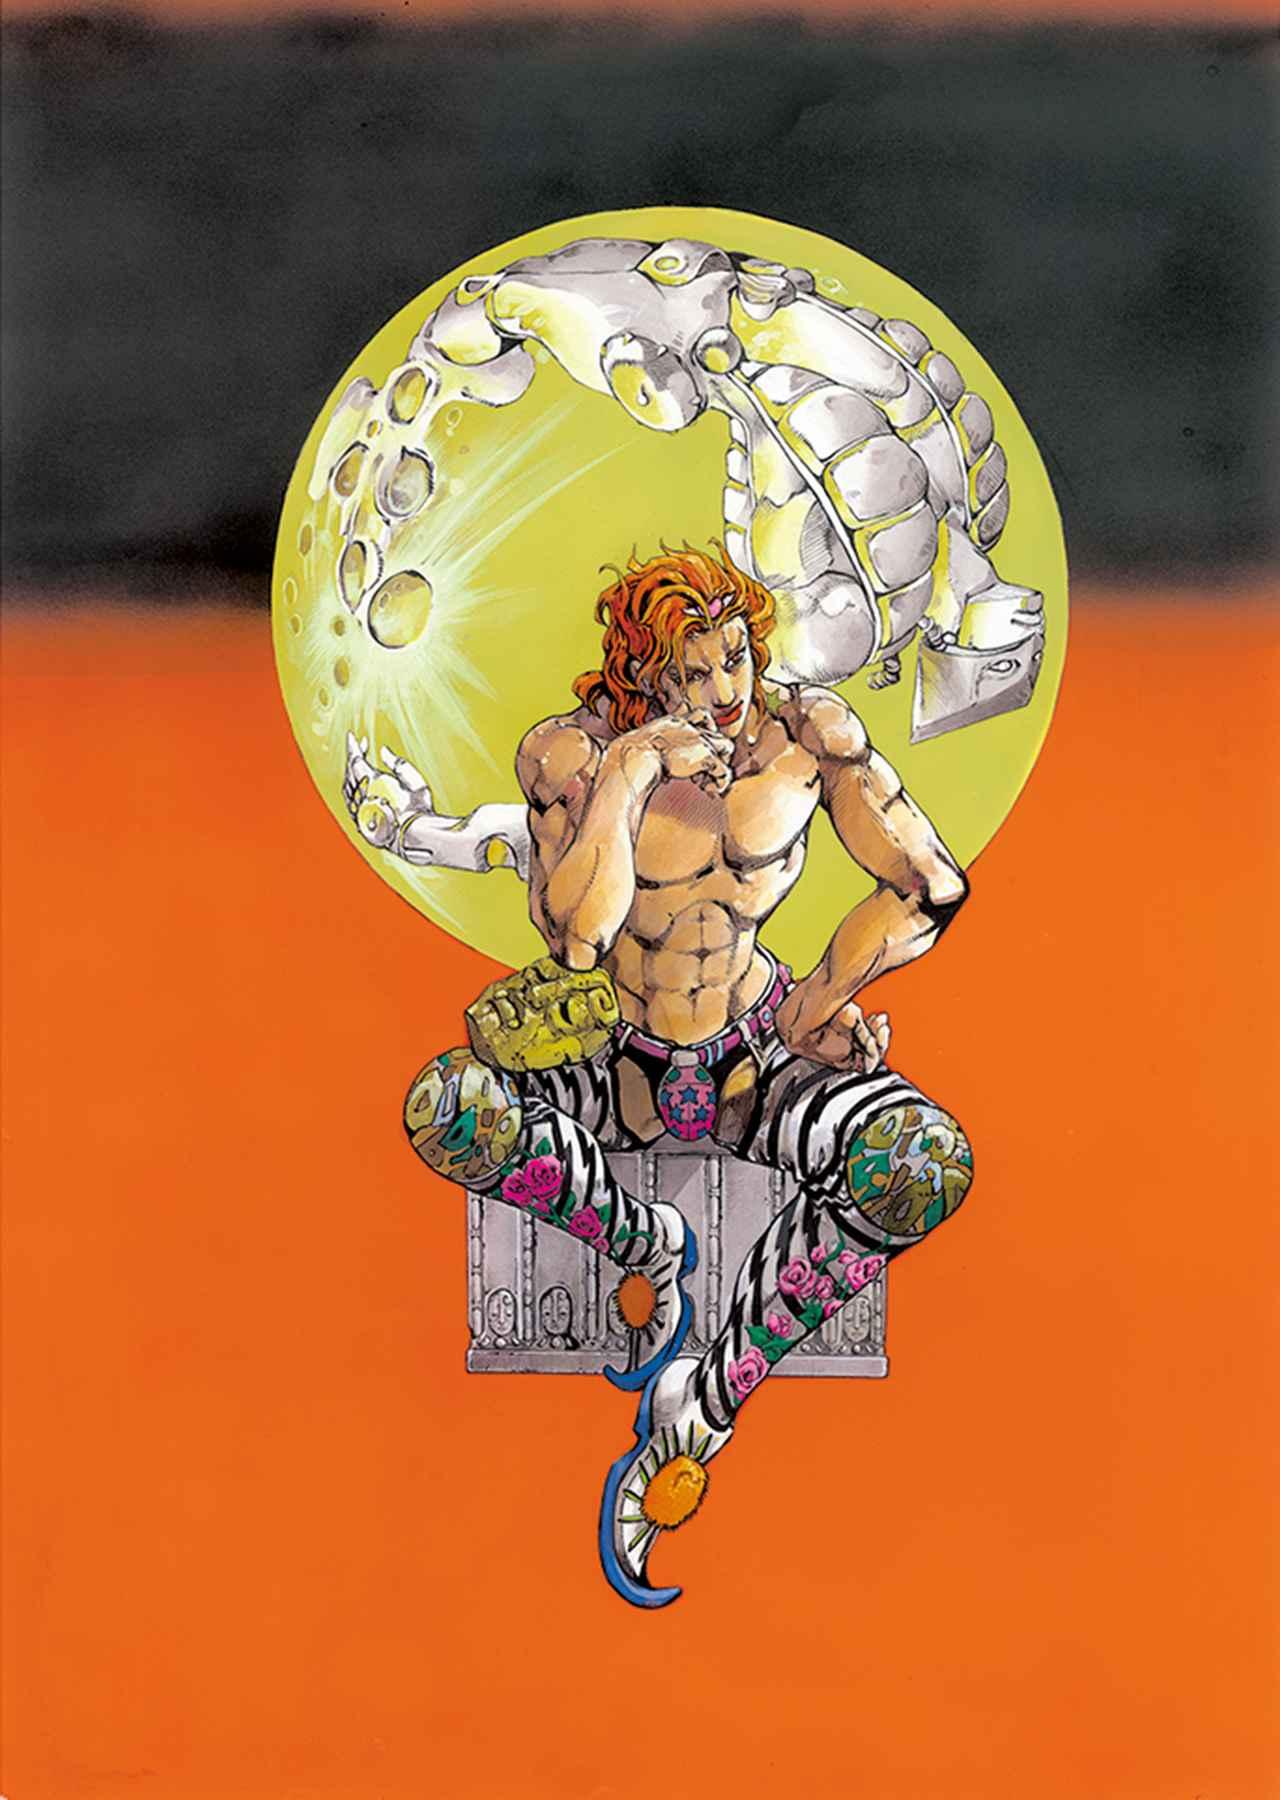 Images : 21番目の画像 - 「スペシャル インタビュー 漫画家・荒木飛呂彦の化学反応」のアルバム - T JAPAN:The New York Times Style Magazine 公式サイト